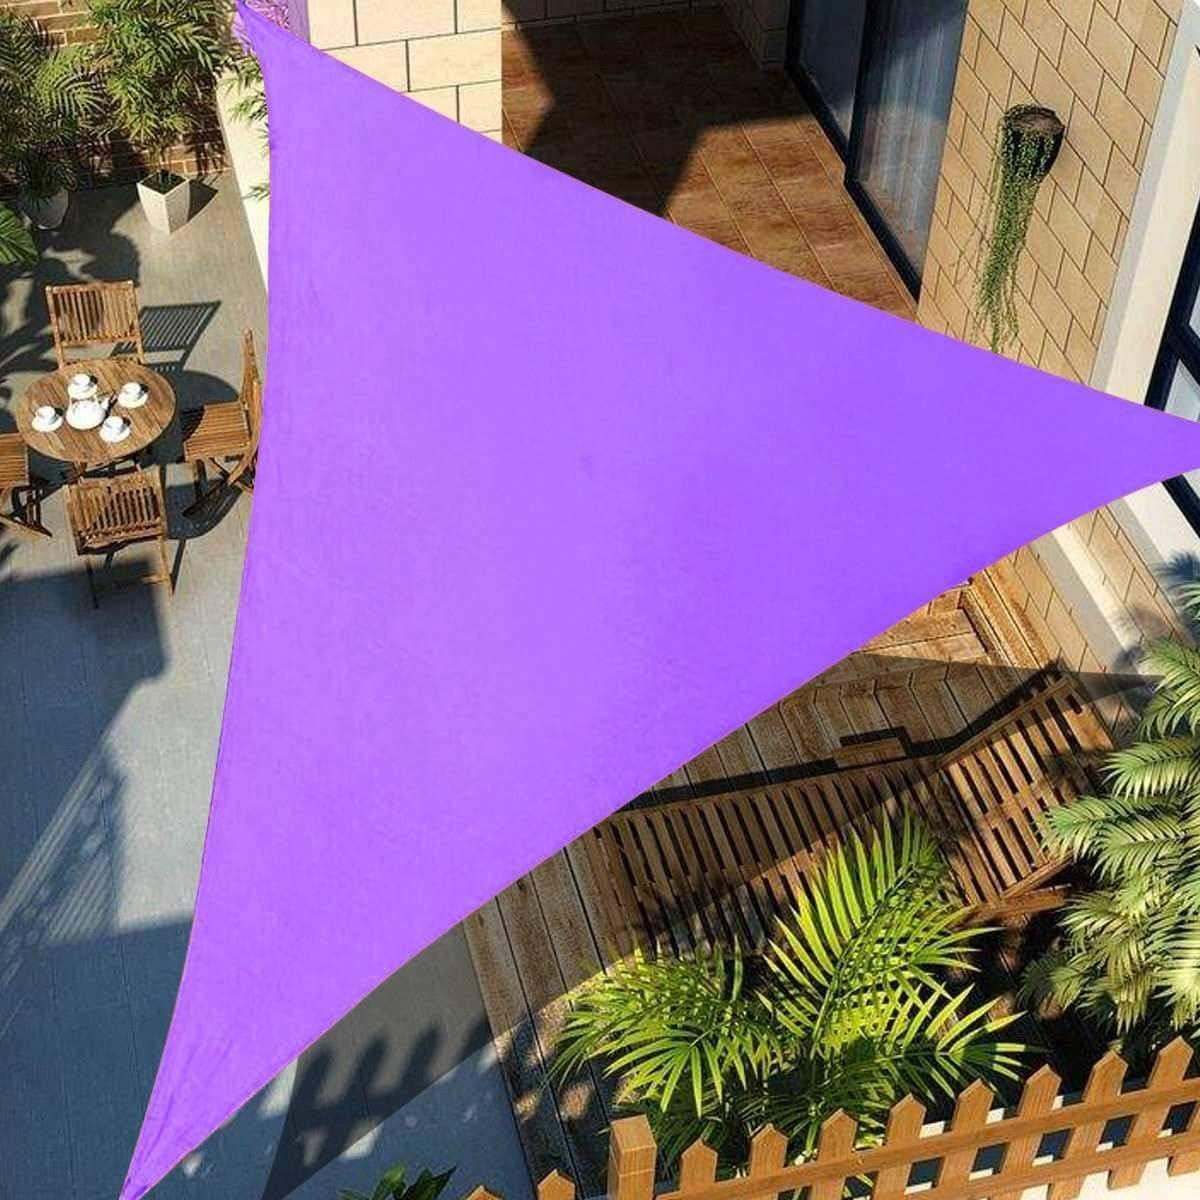 ZHANGDAN Sun Shade Sail Triangle, terraza del Patio Pergola al Aire Libre Sun Sail Shade Bloque UV Sombrilla Color Arena, Opcional, Purple-M(4m): Amazon.es: Jardín